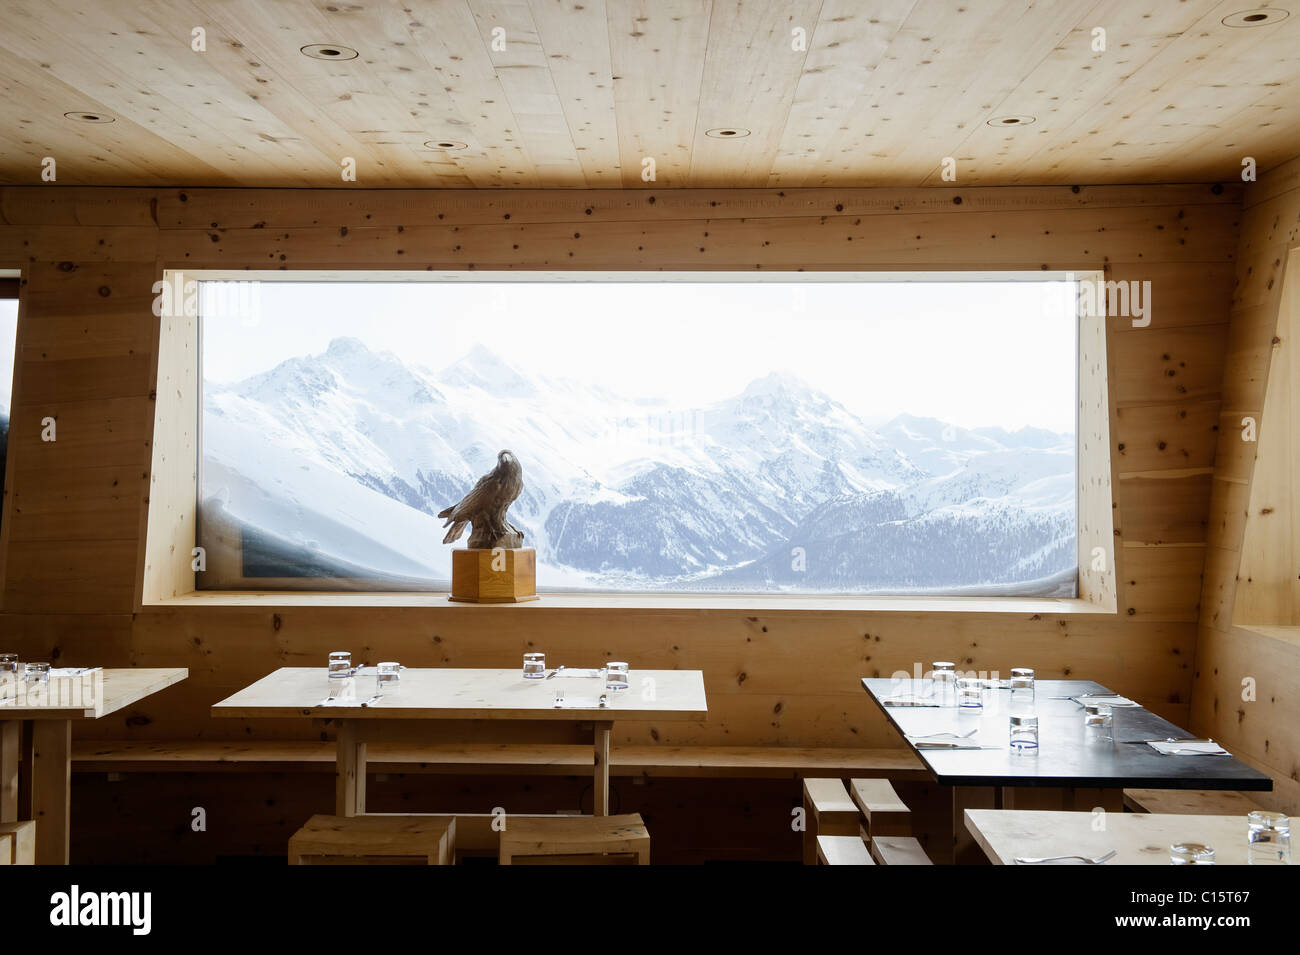 Ventana panorámica con paisajes de montaña en la corviglia Club, St Moritz Imagen De Stock